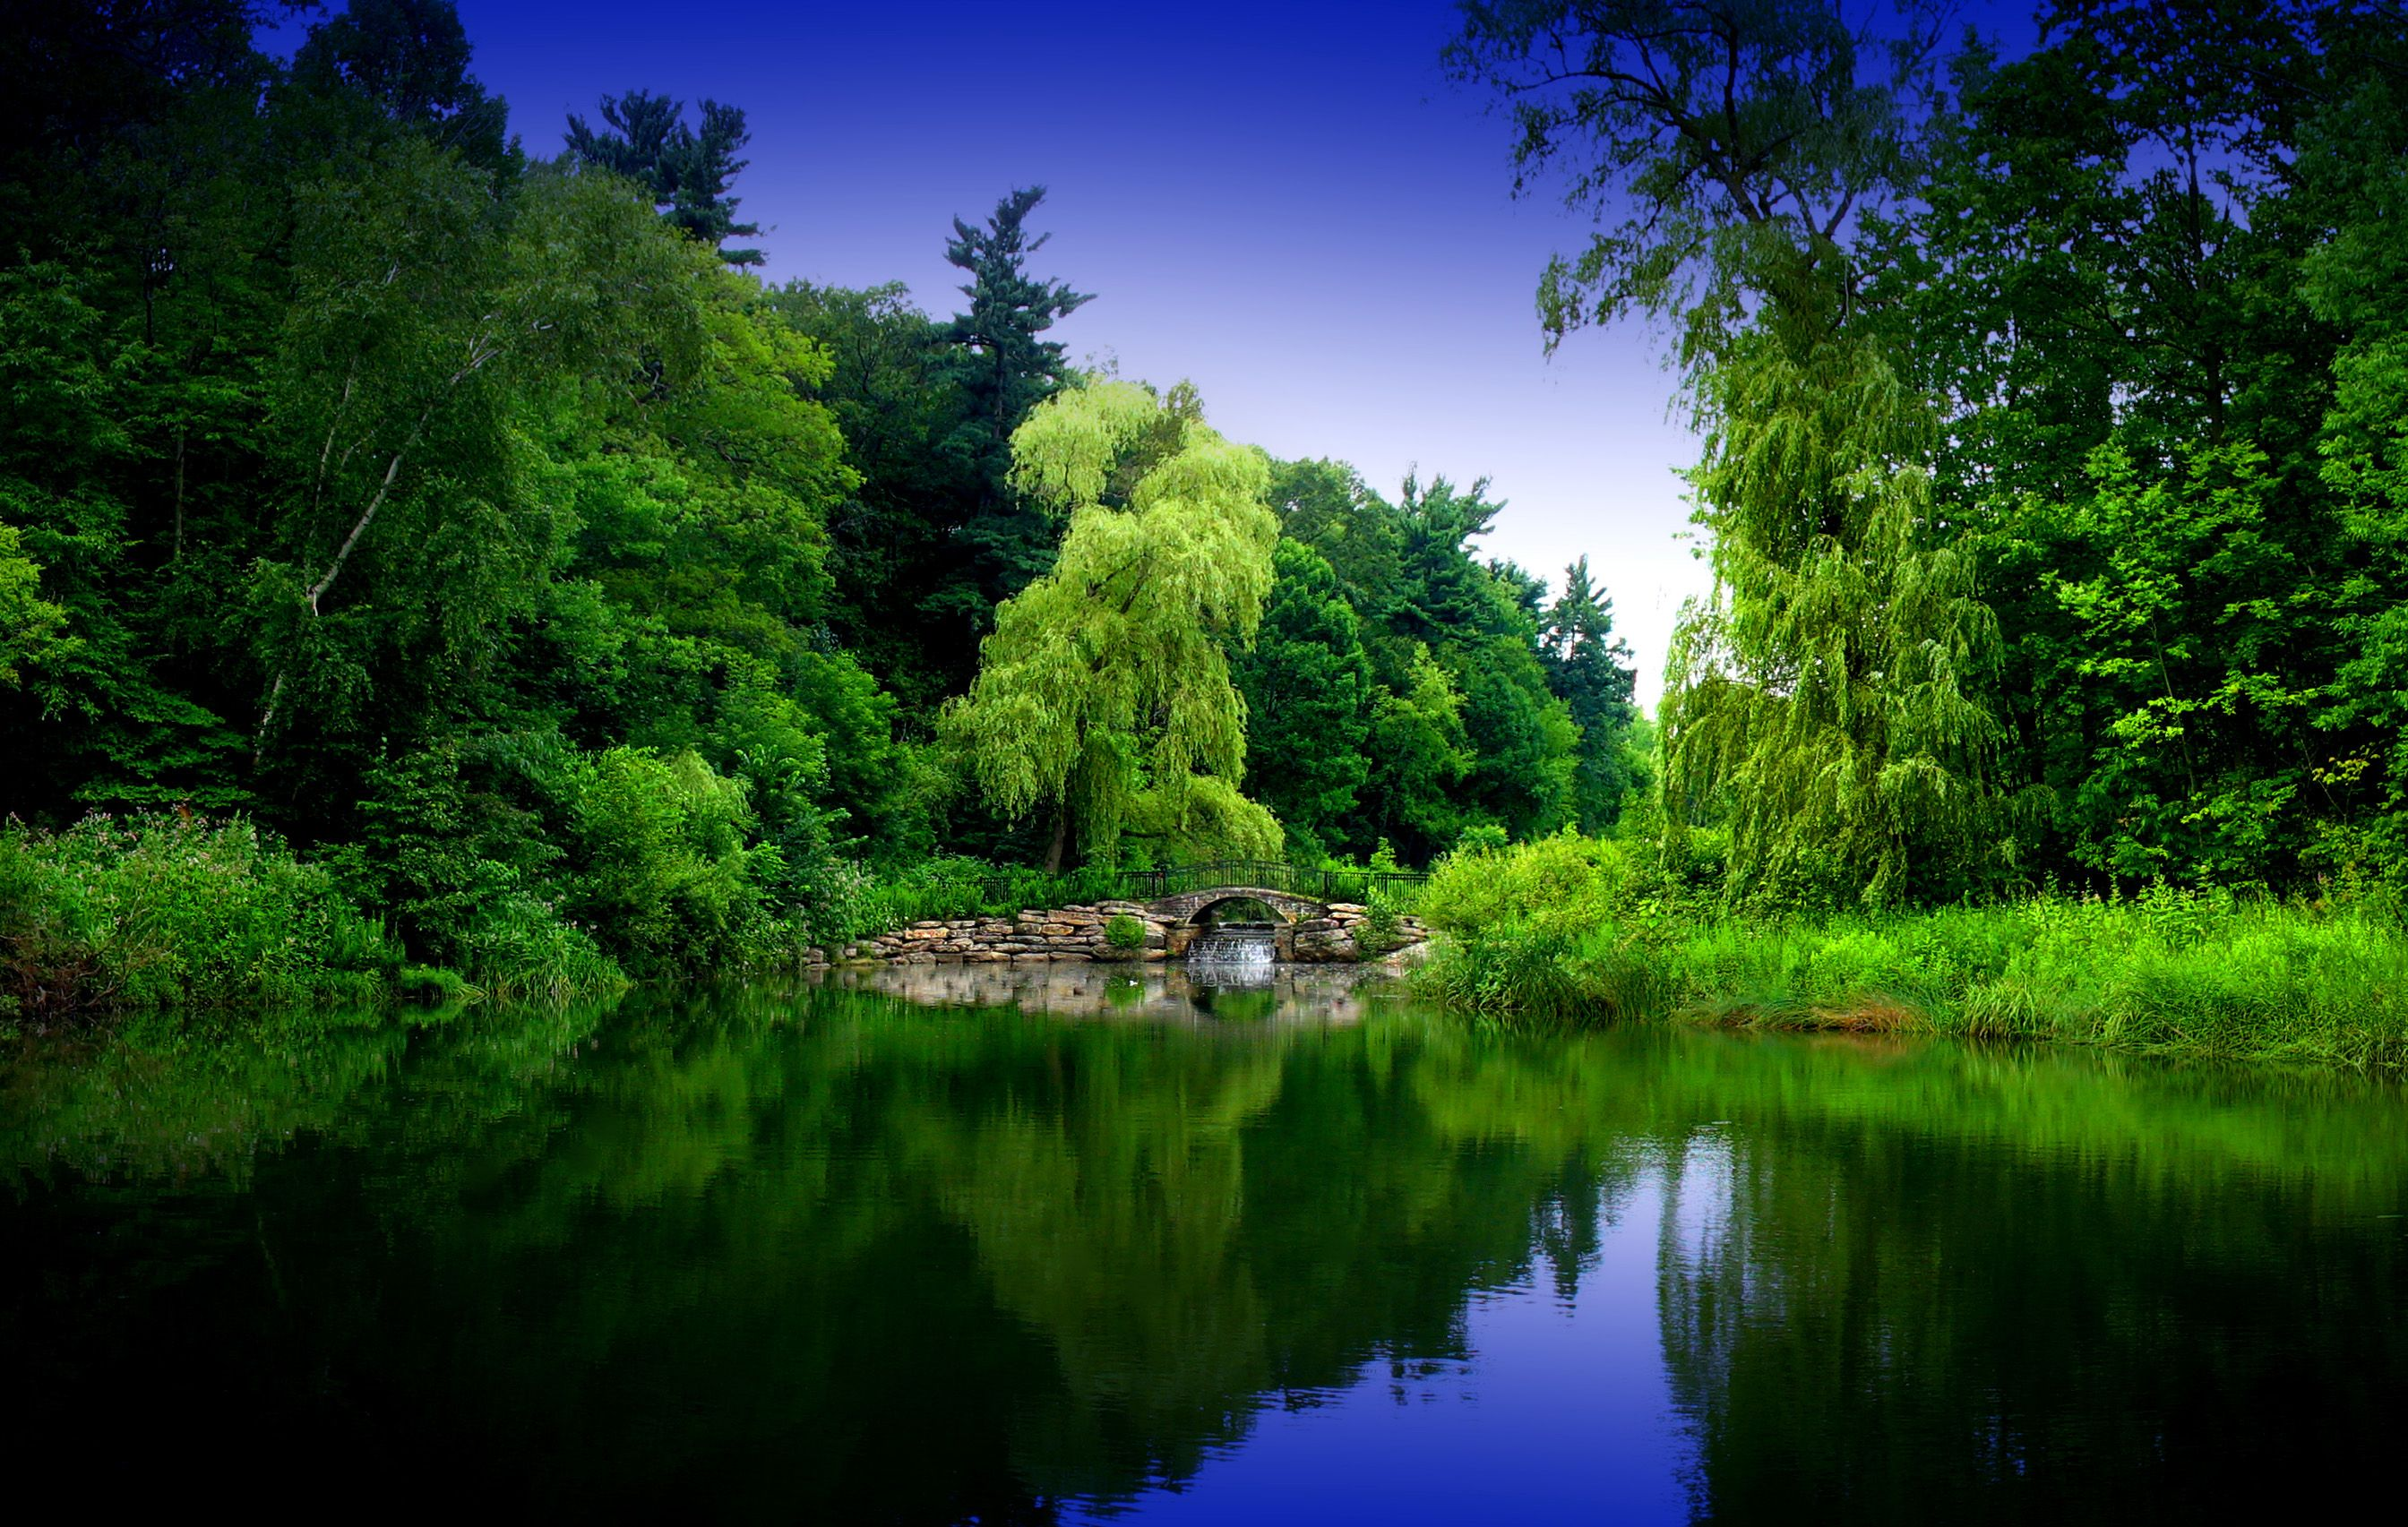 ZEN - my safe place | Zen garden, Hd nature wallpapers ...